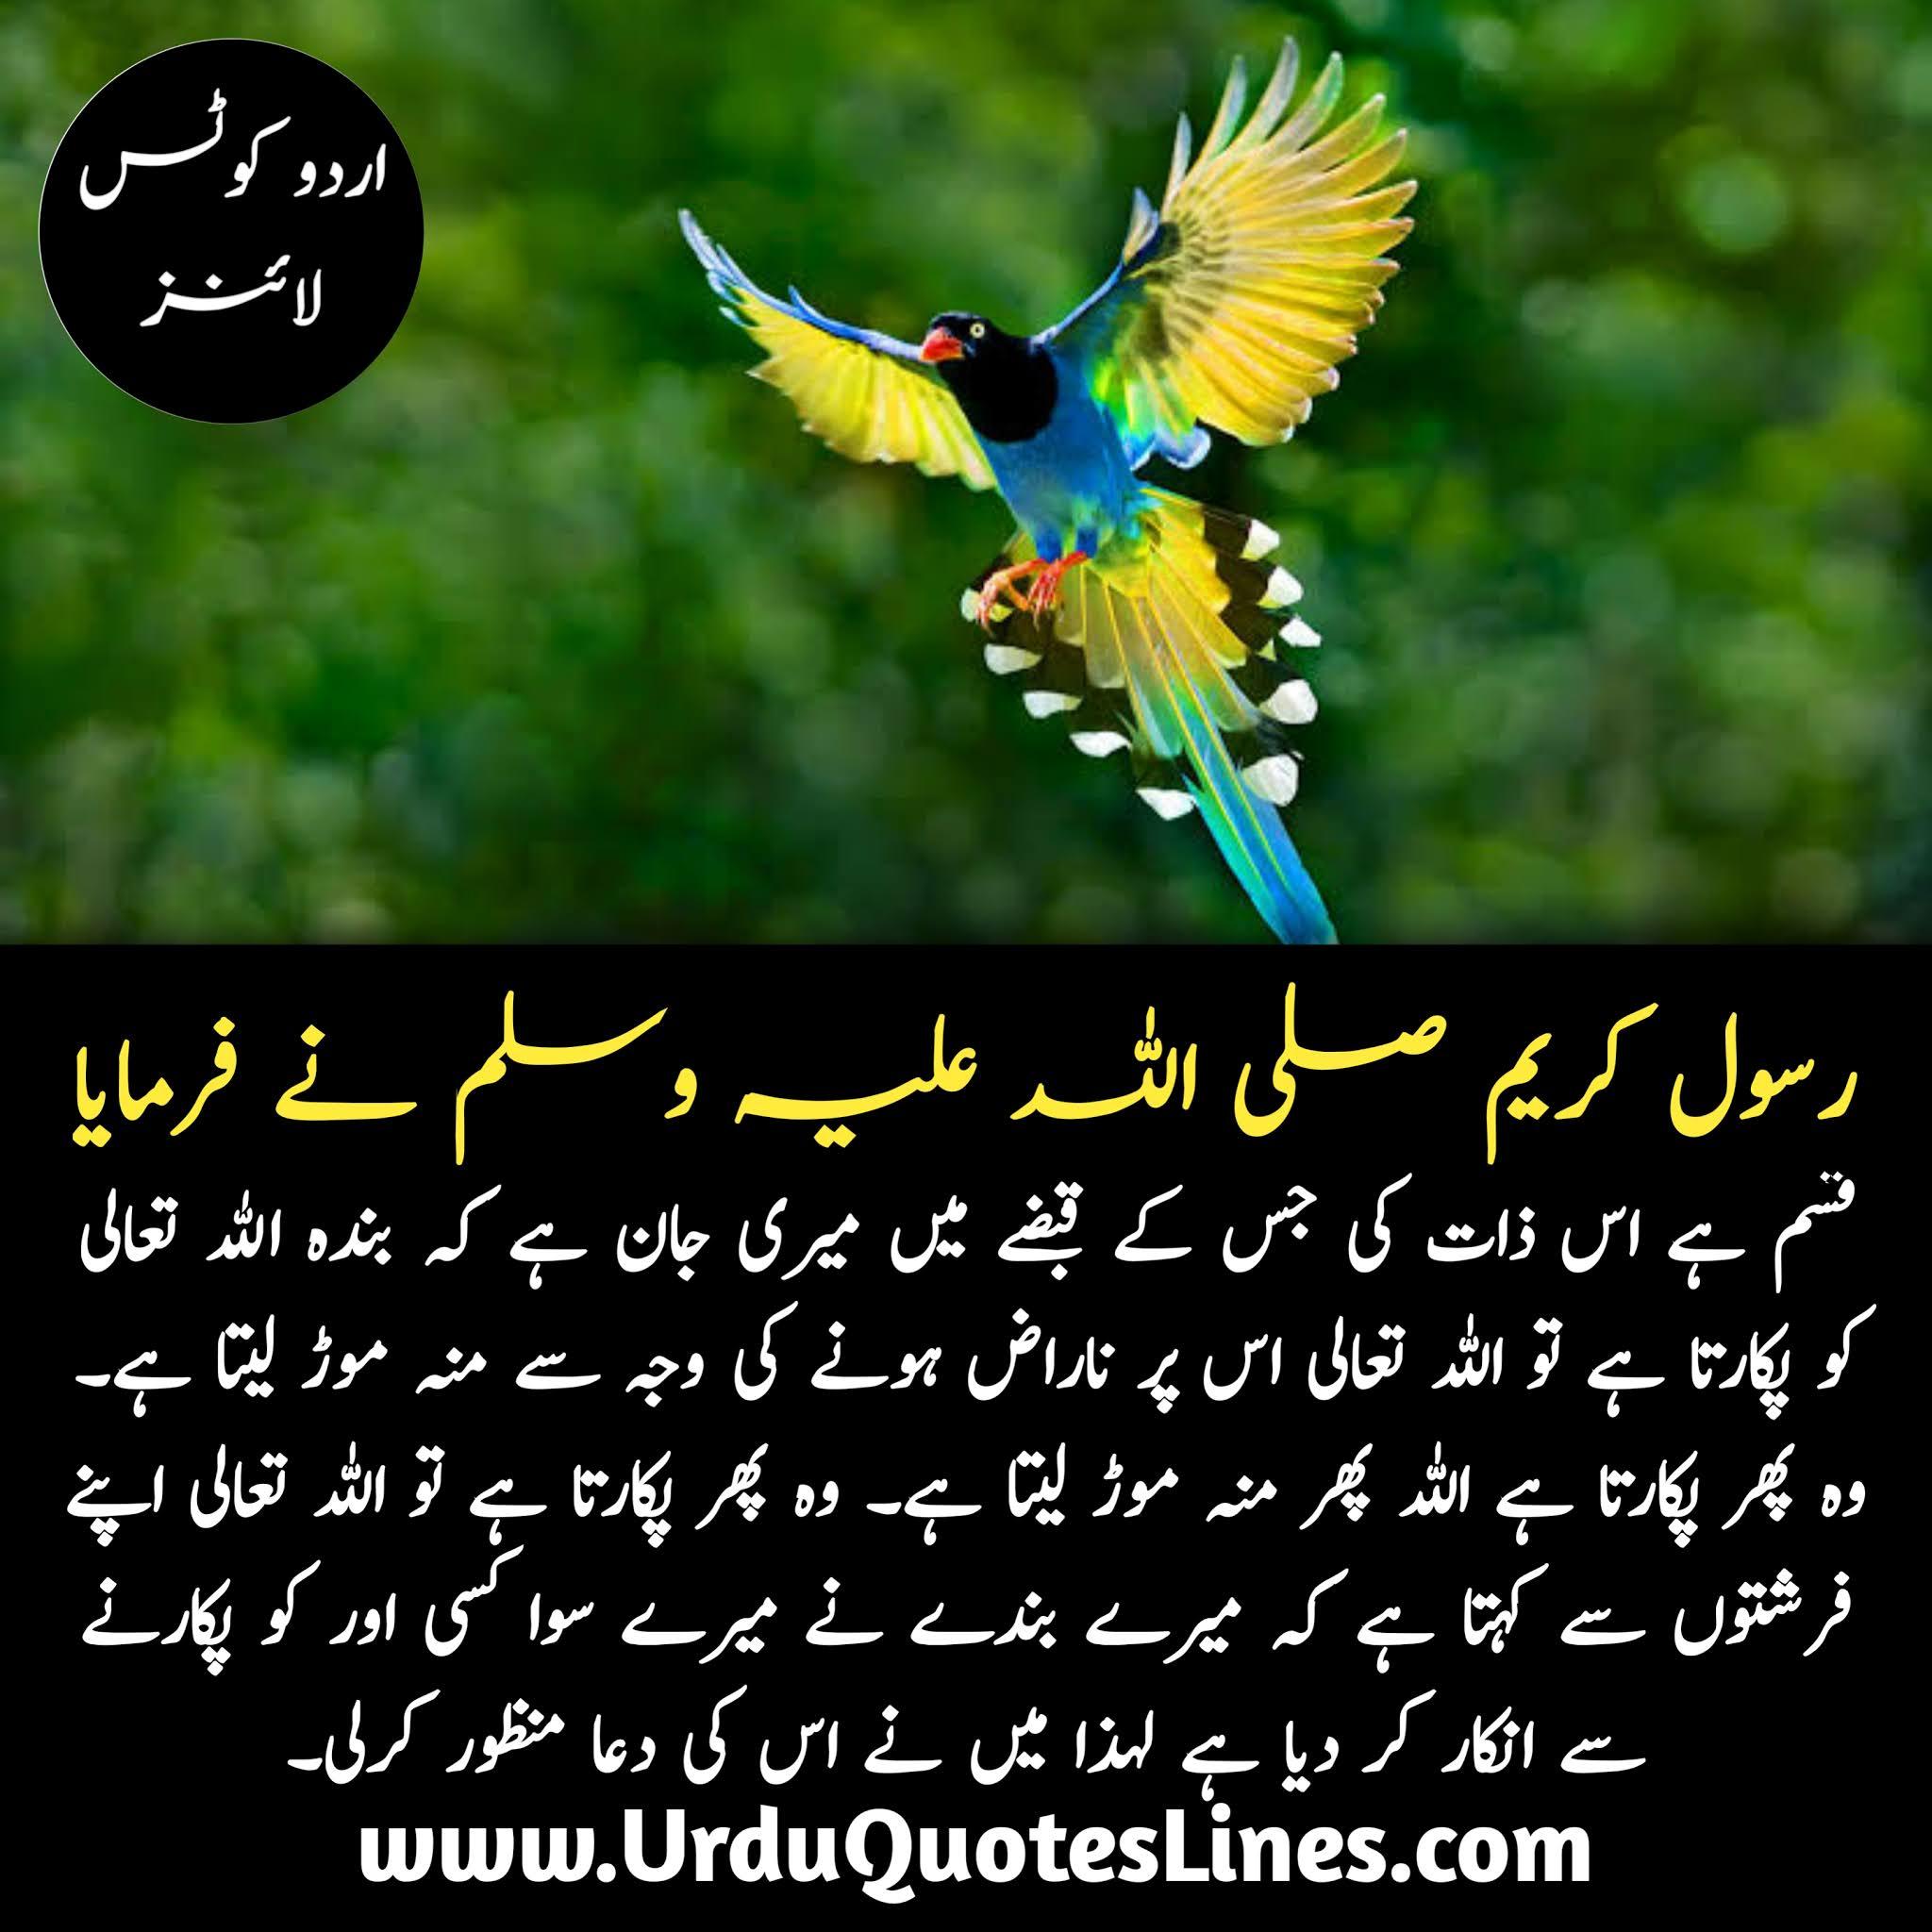 Prophet Muhammad Urdu Quotes Lines About Islam